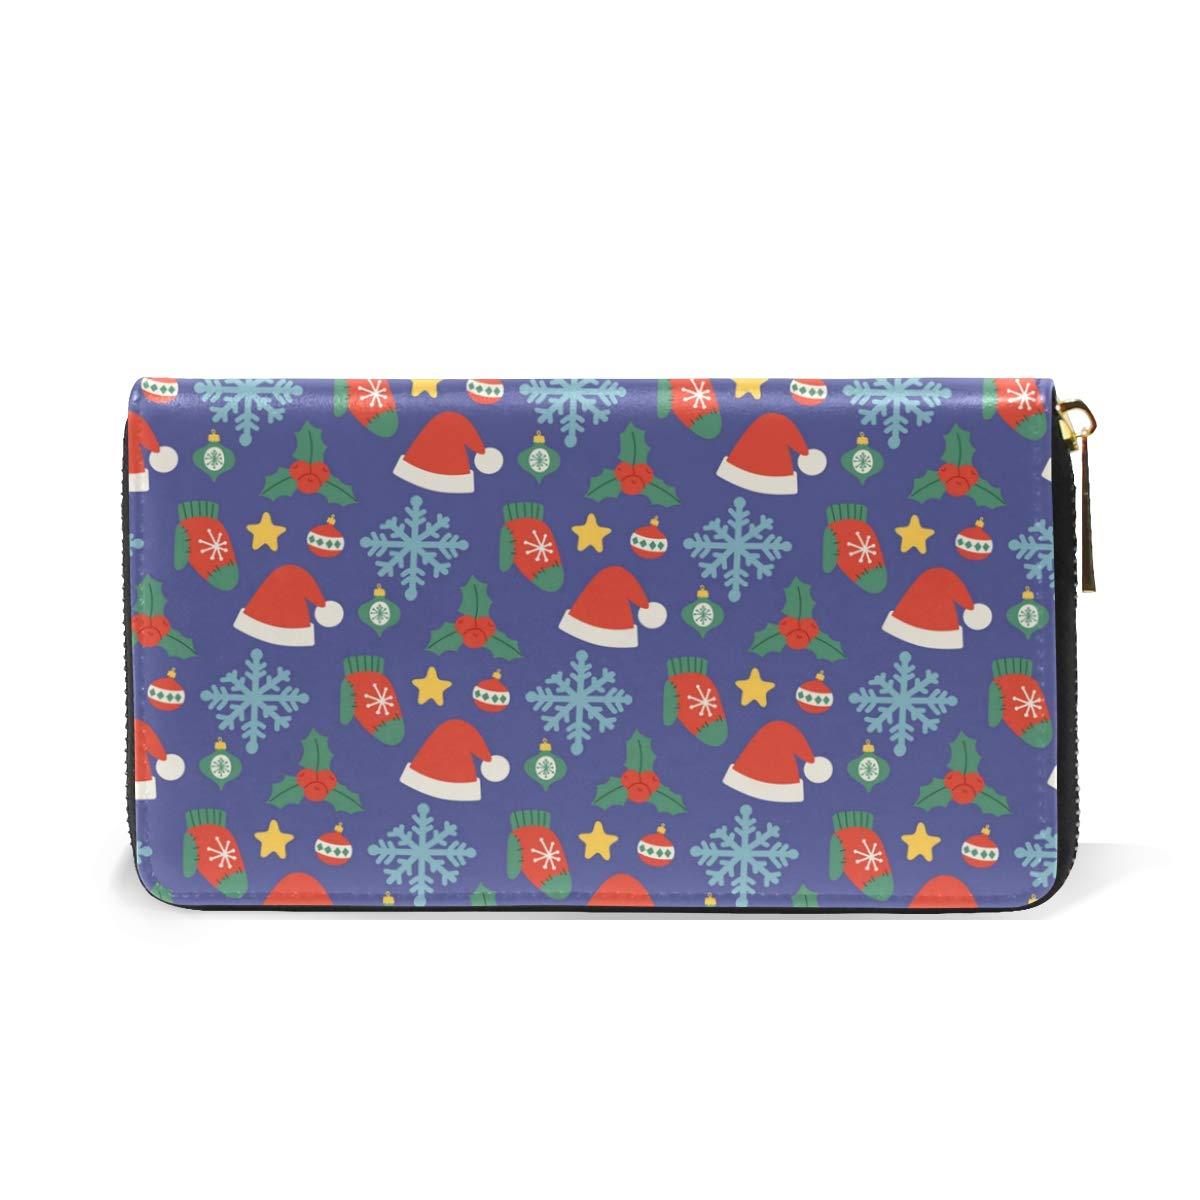 Ornaments Berenstain Bears Christmas Real Leather Zip Around Wallet Wristlet minimalist wallet Travel Purse Wristlet